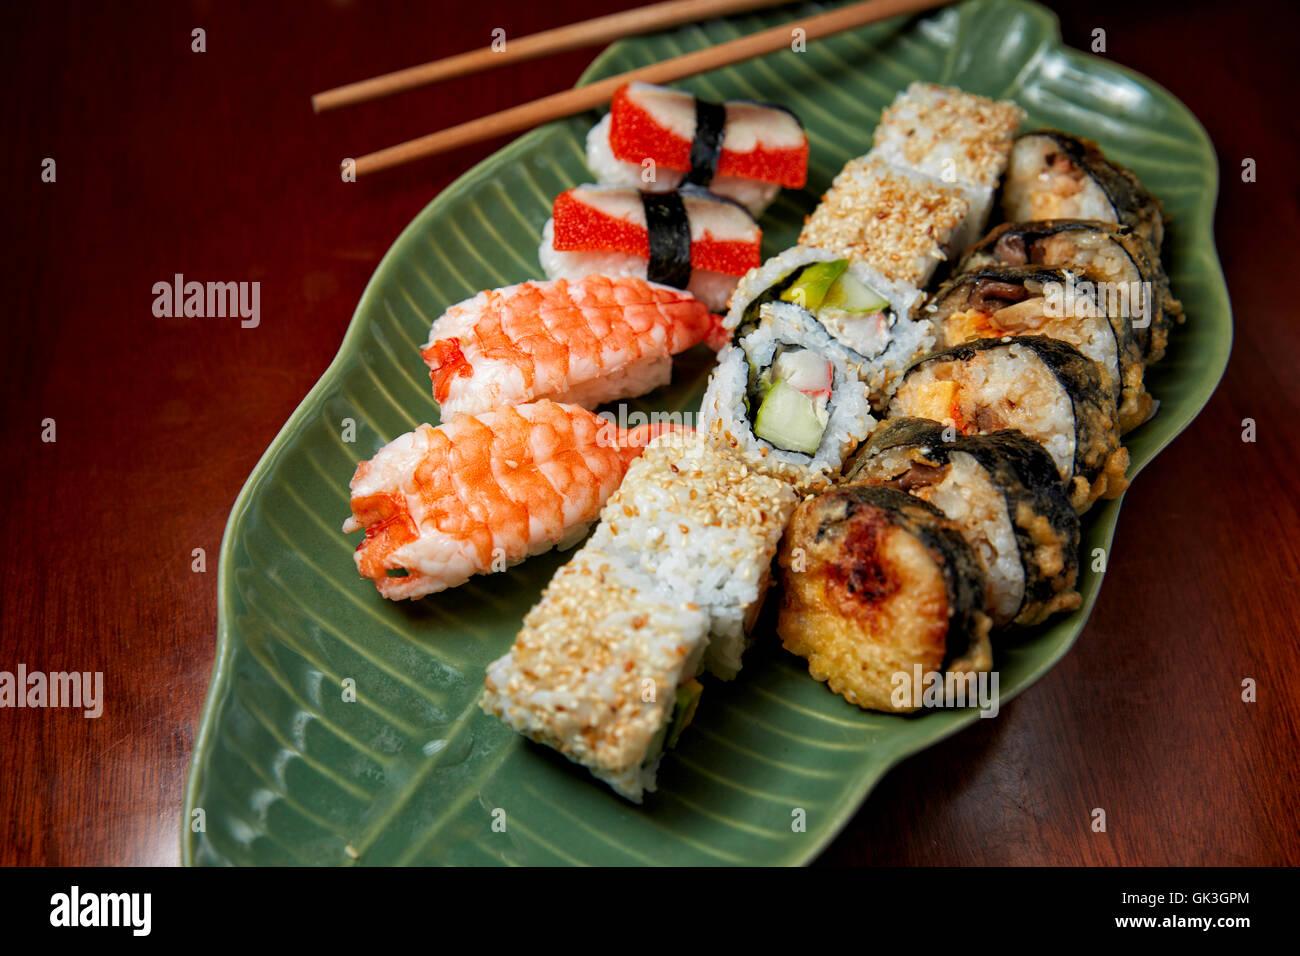 Mixed Sushi and Rolls Platter. Hue, Vietnam. - Stock Image